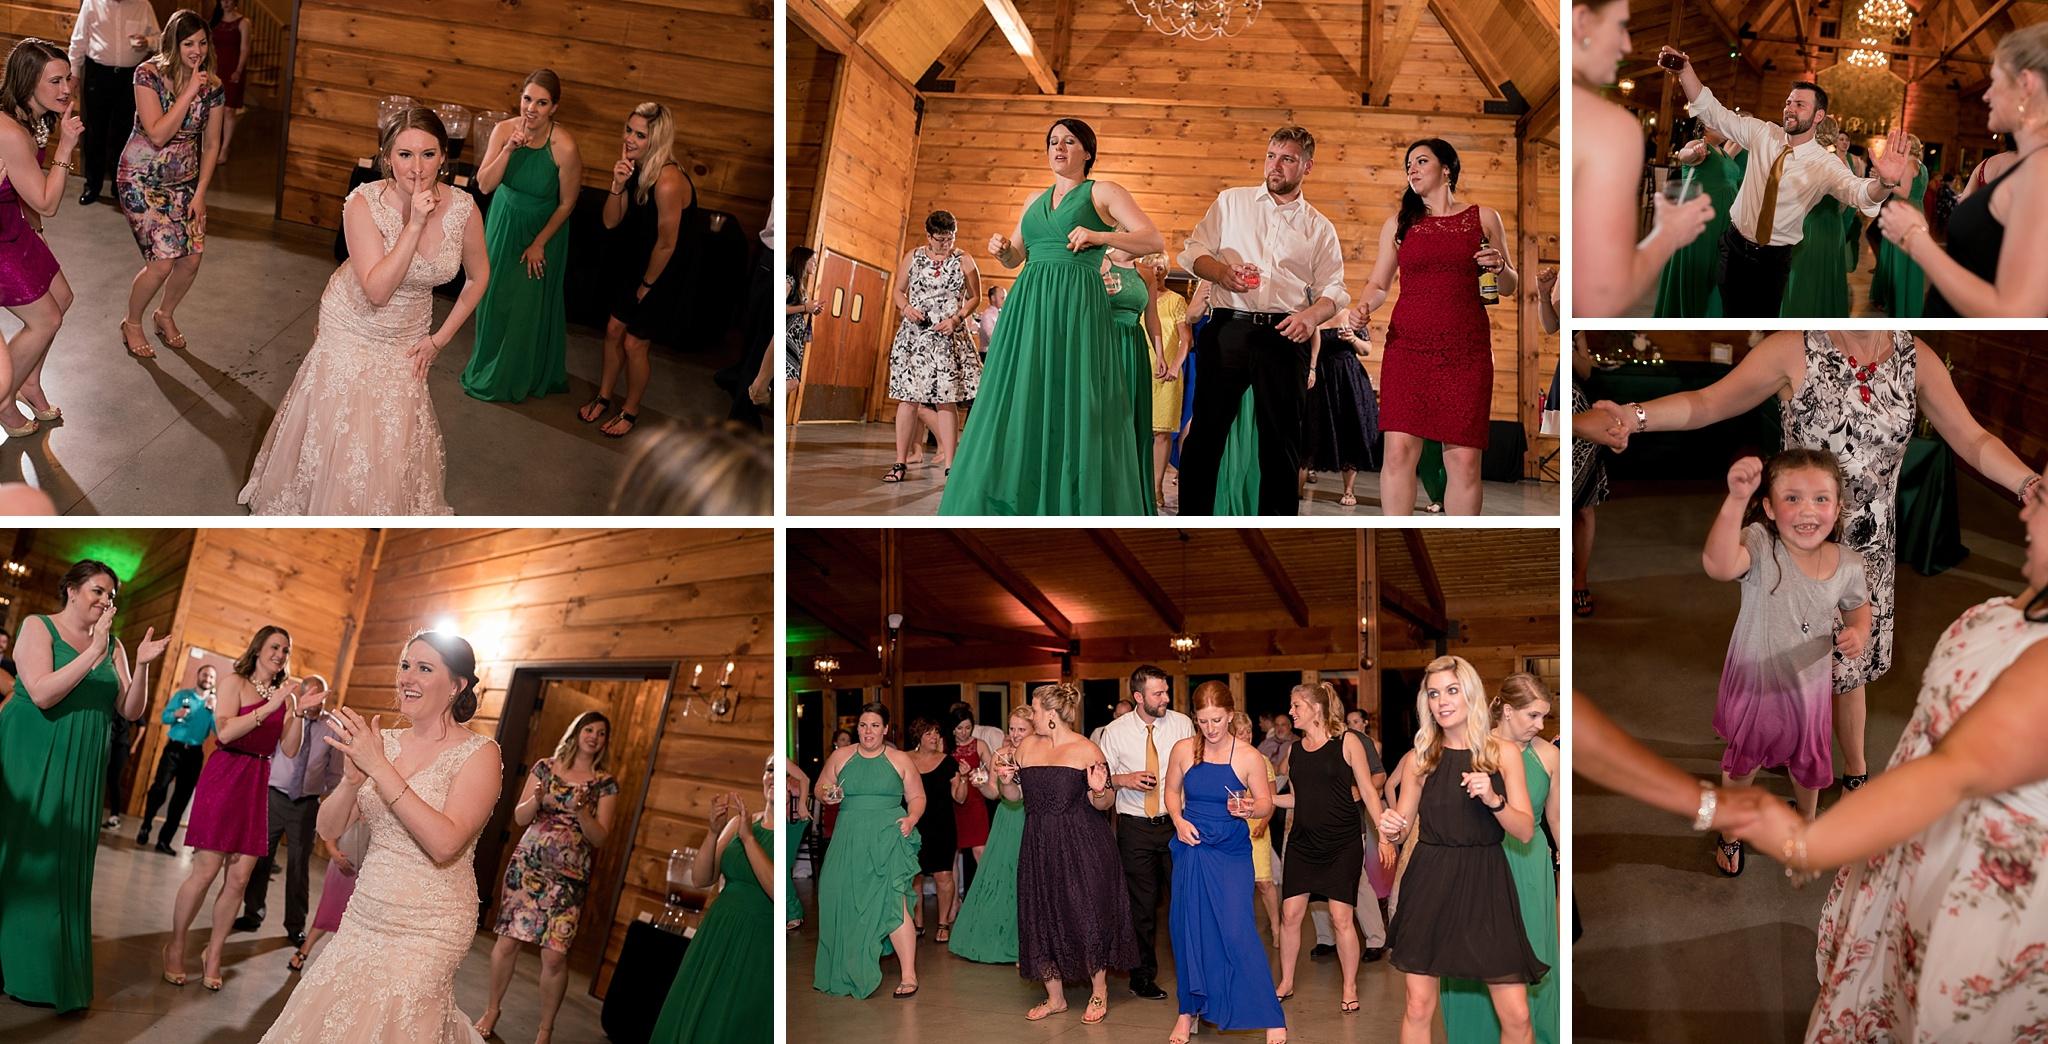 Pavilion-Carriage-Farms-Wedding-Photographer-232.jpg